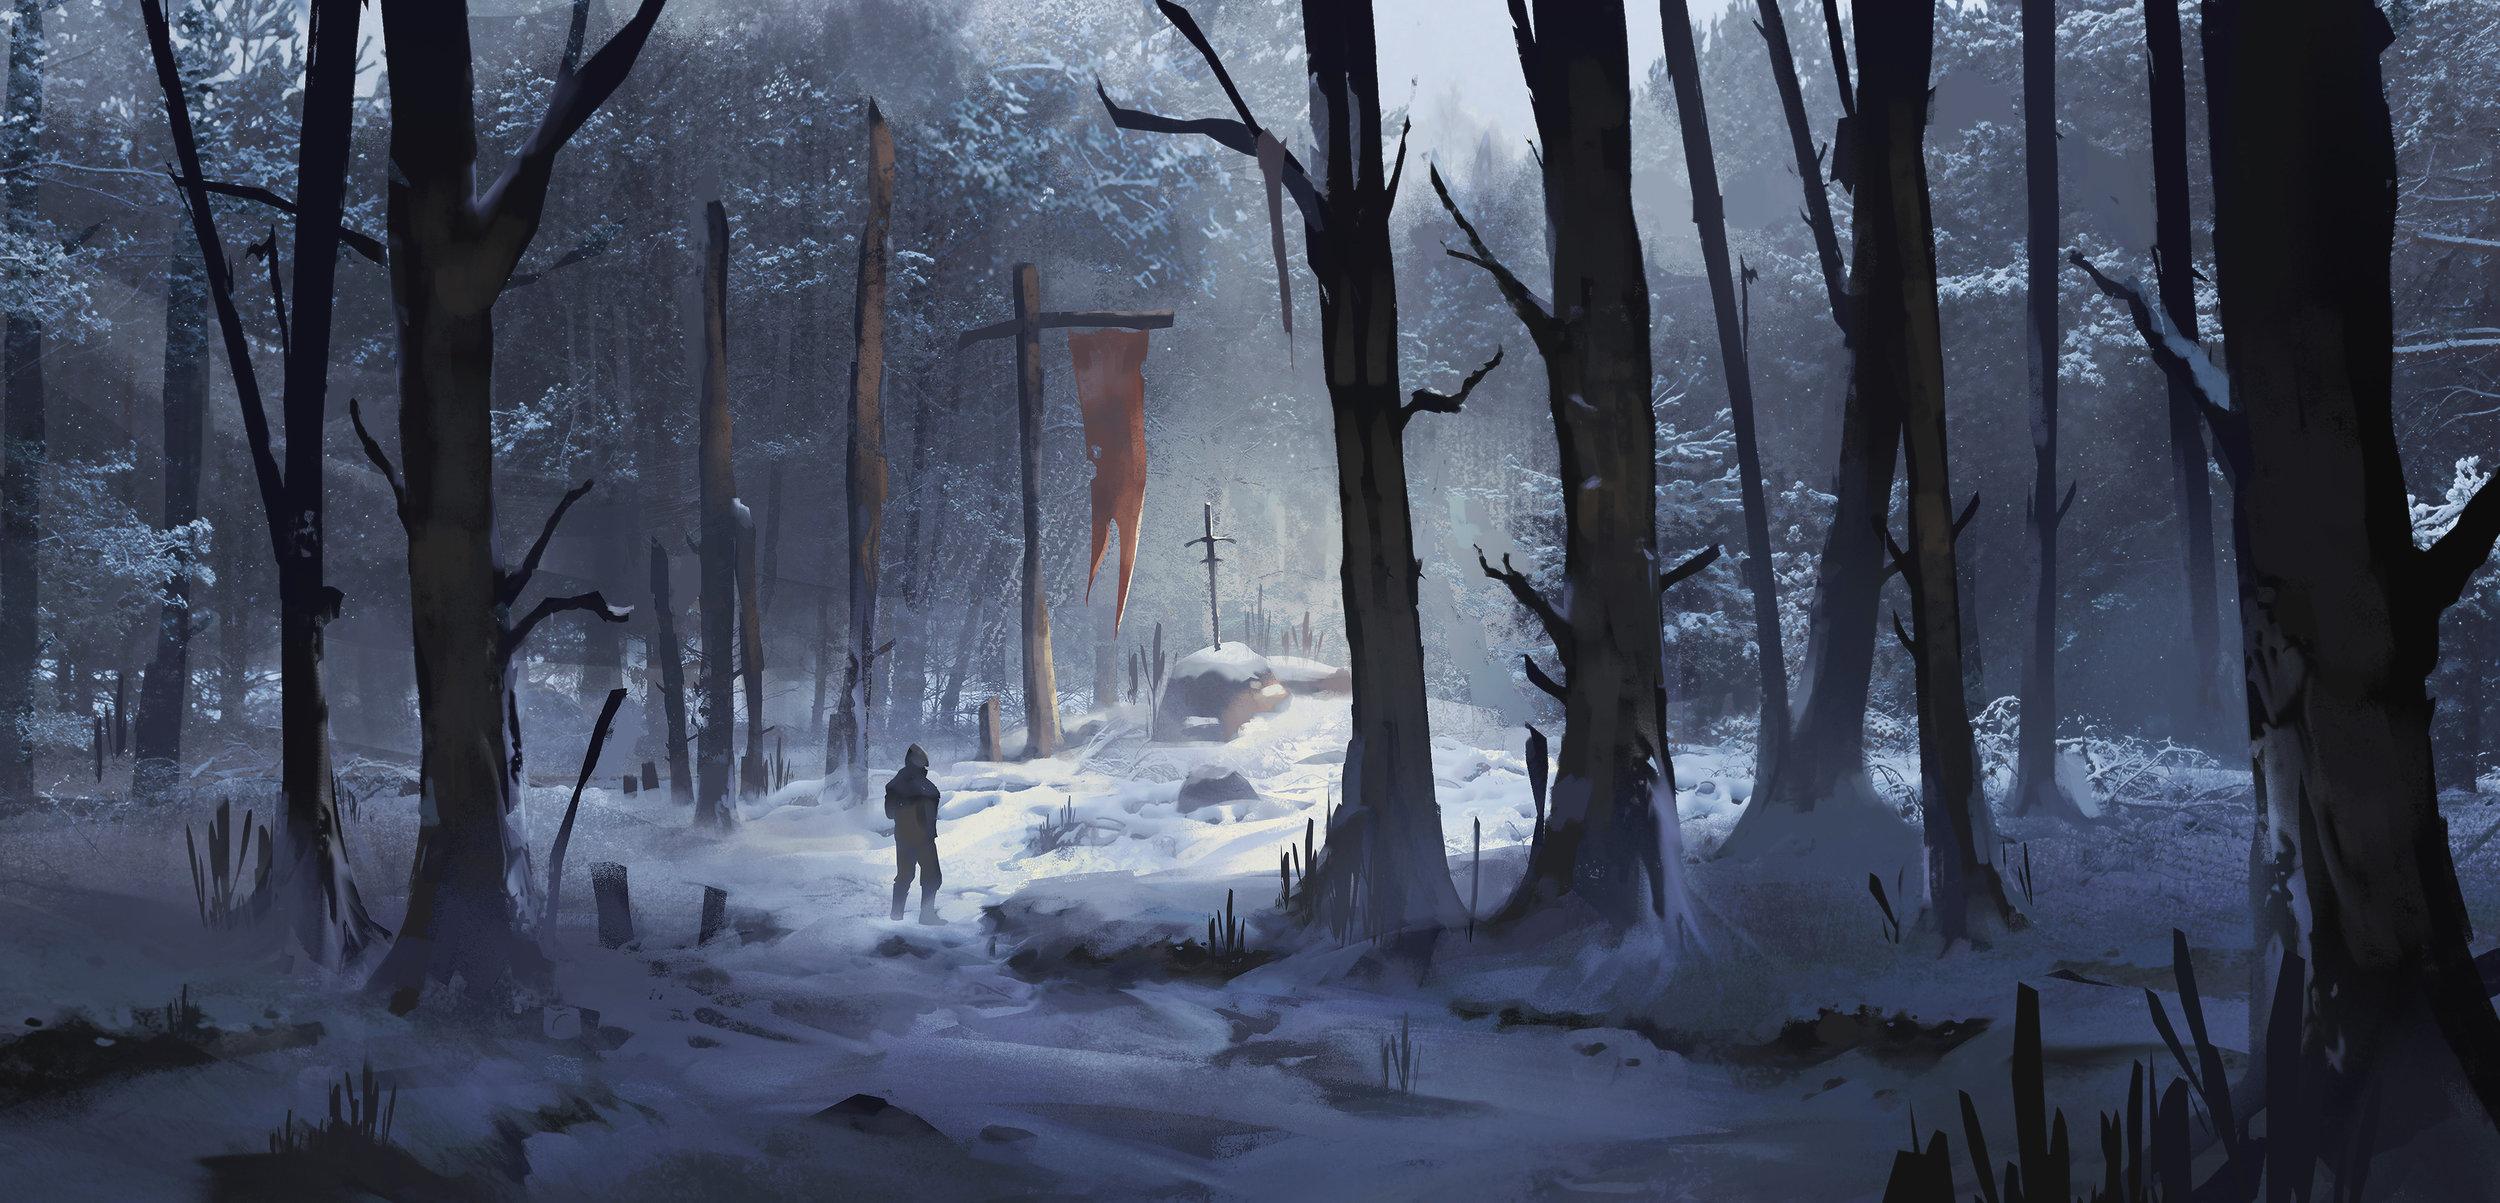 Artist: Jordan Grimmer Sourced:  http://bit.ly/2VWXocb